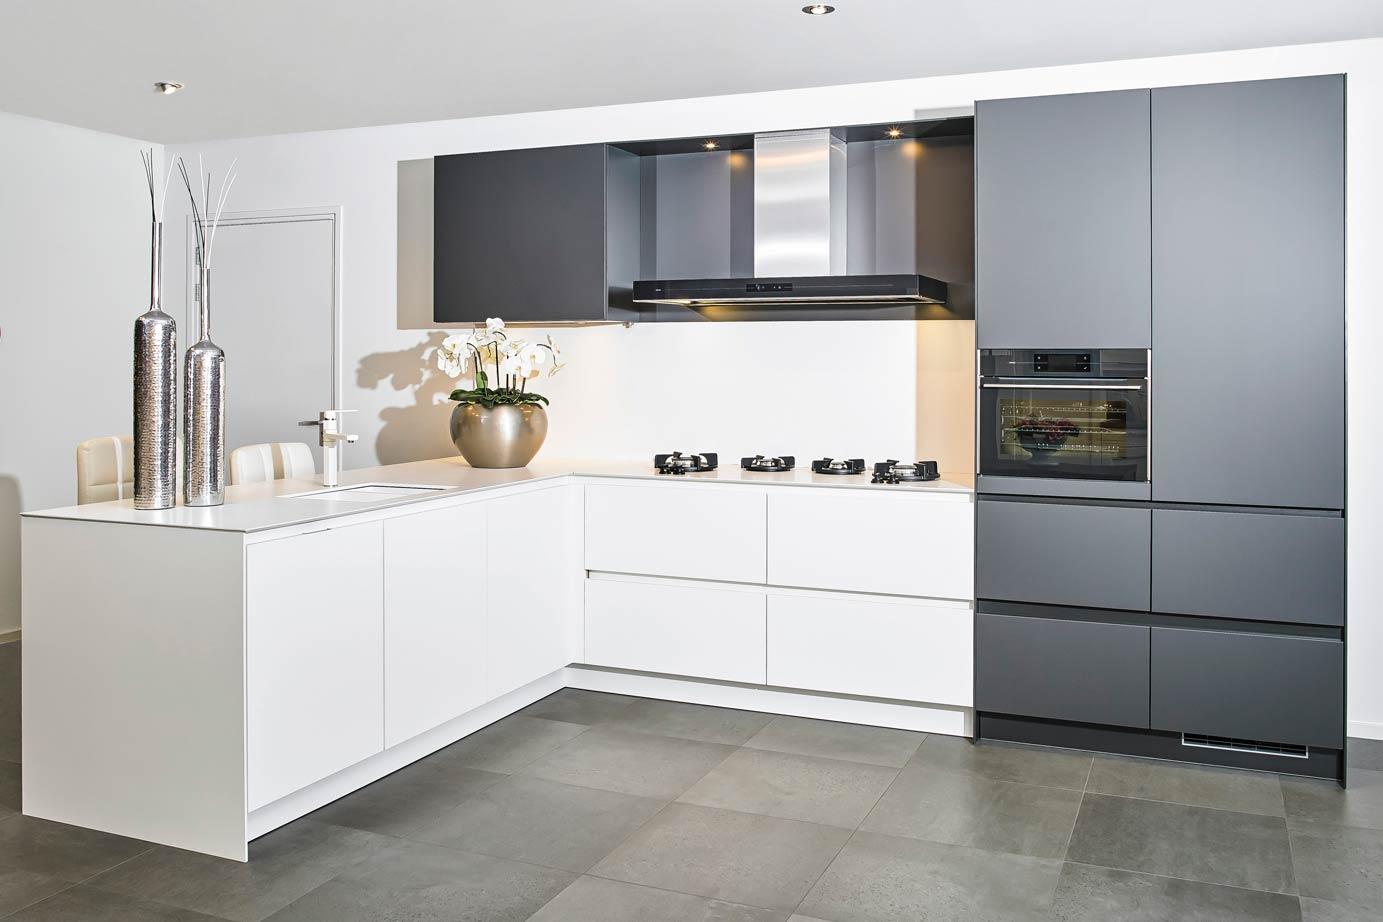 Moderne Keukens Wit : Moderne hoekkeuken in mat zwart en mat wit db keukens